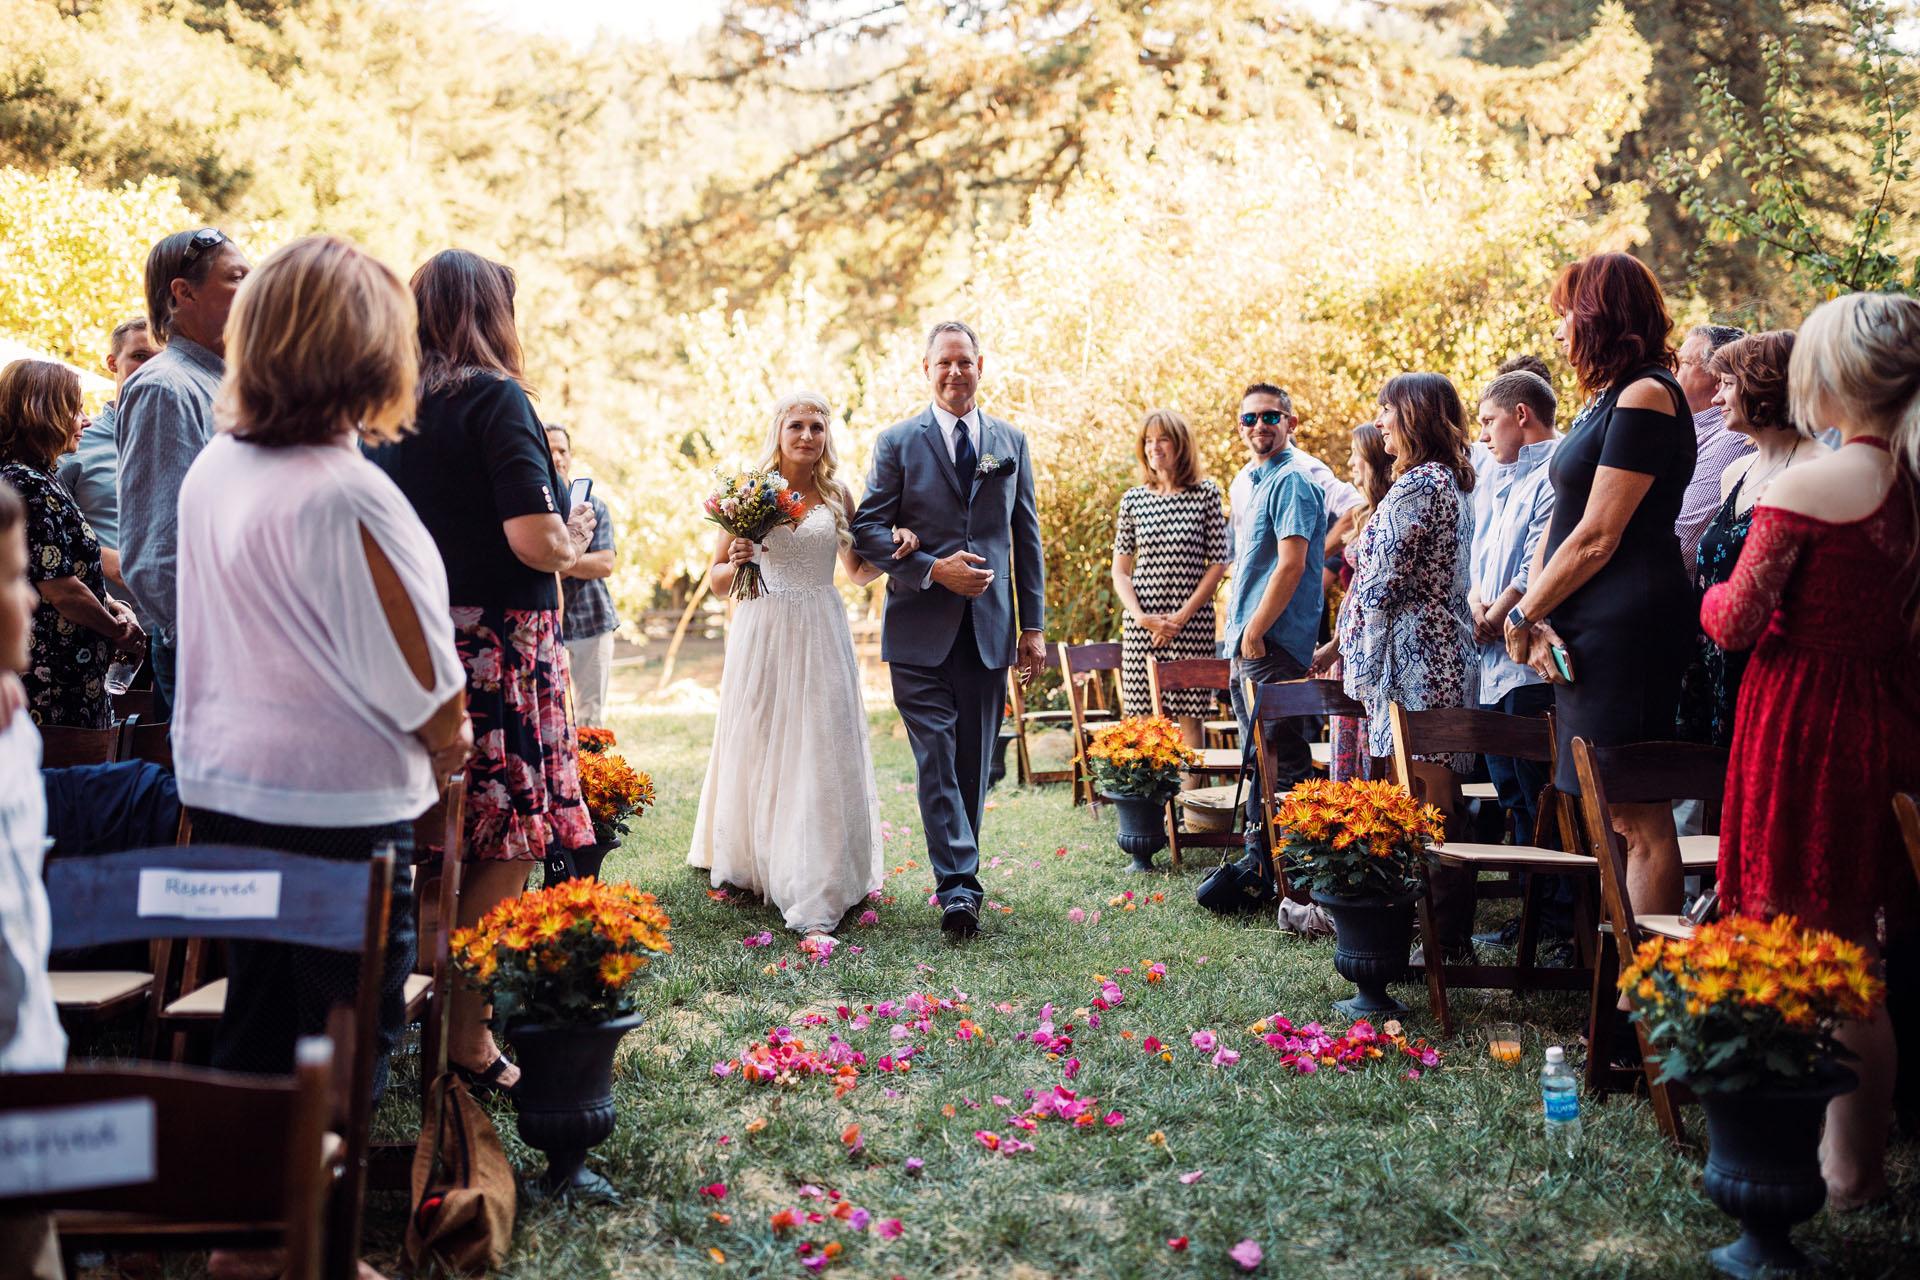 10-7-17 Devon and Jordan's Wedding-103.jpg